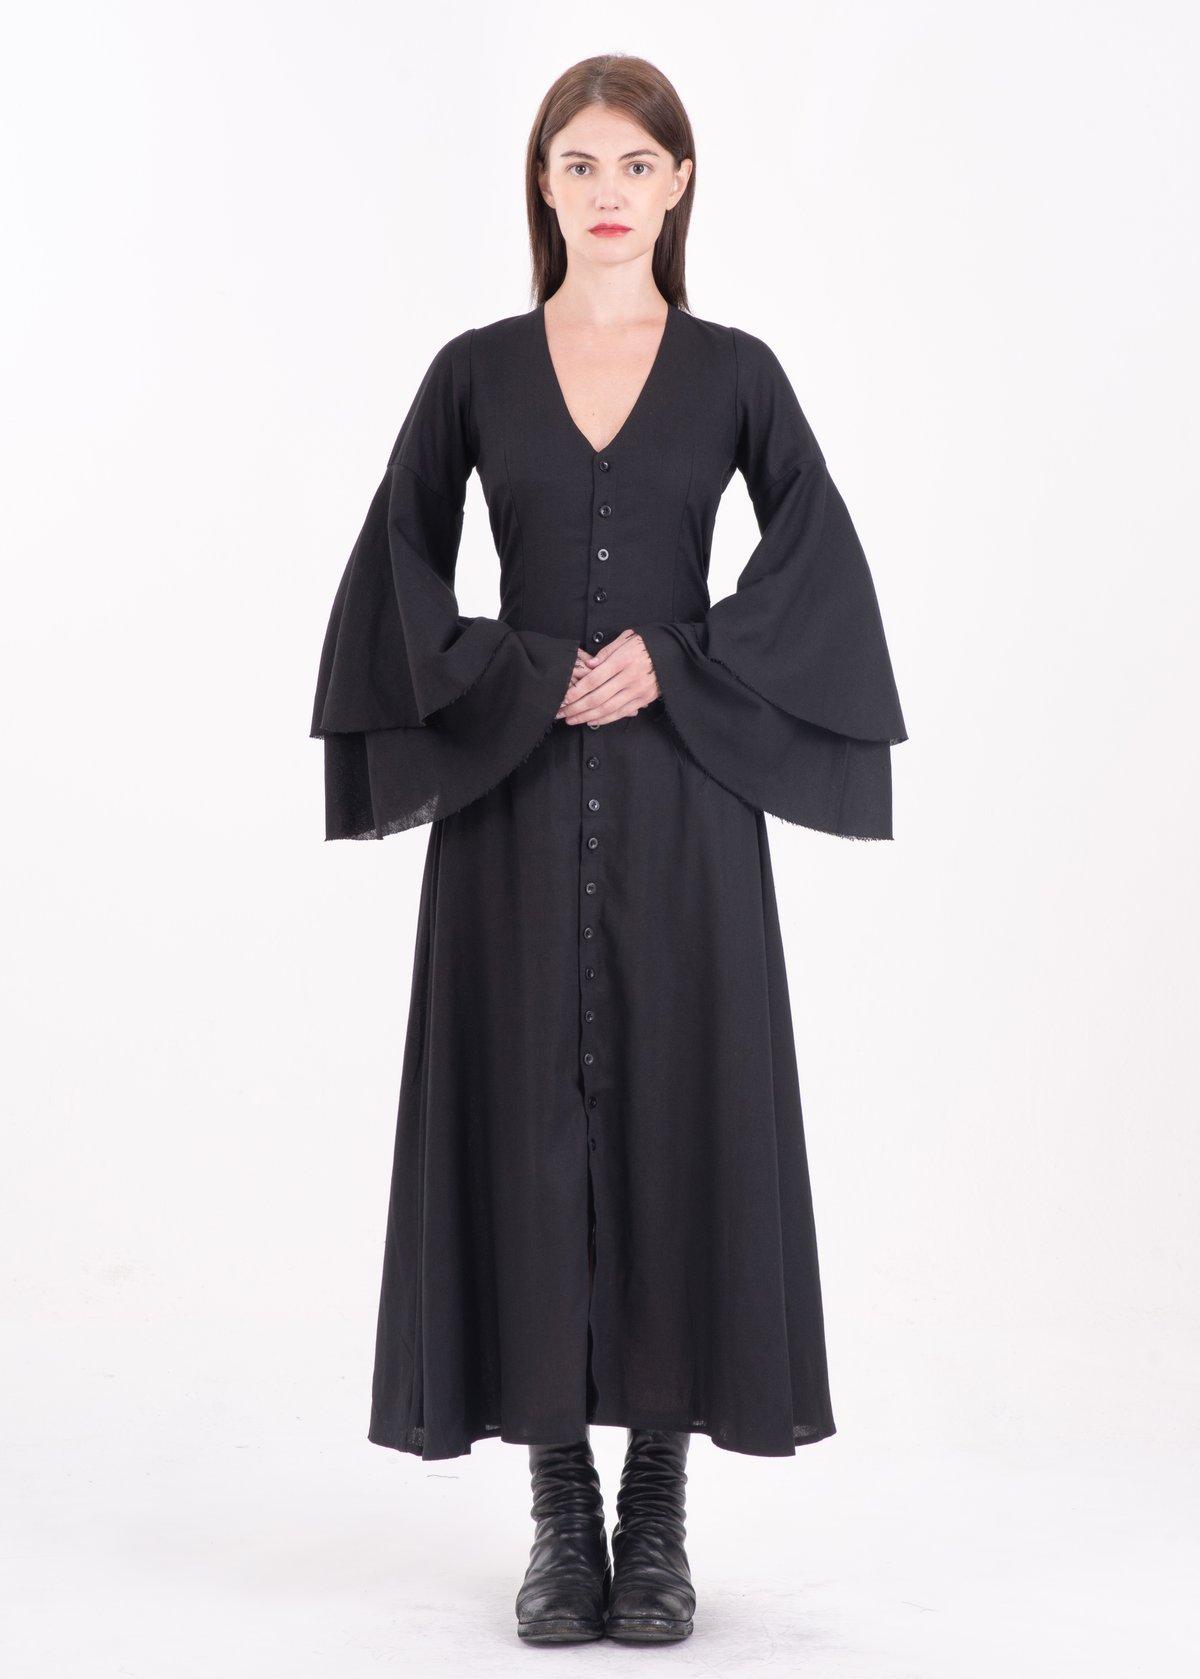 Image of Diane Layered Sleeve Long Dress